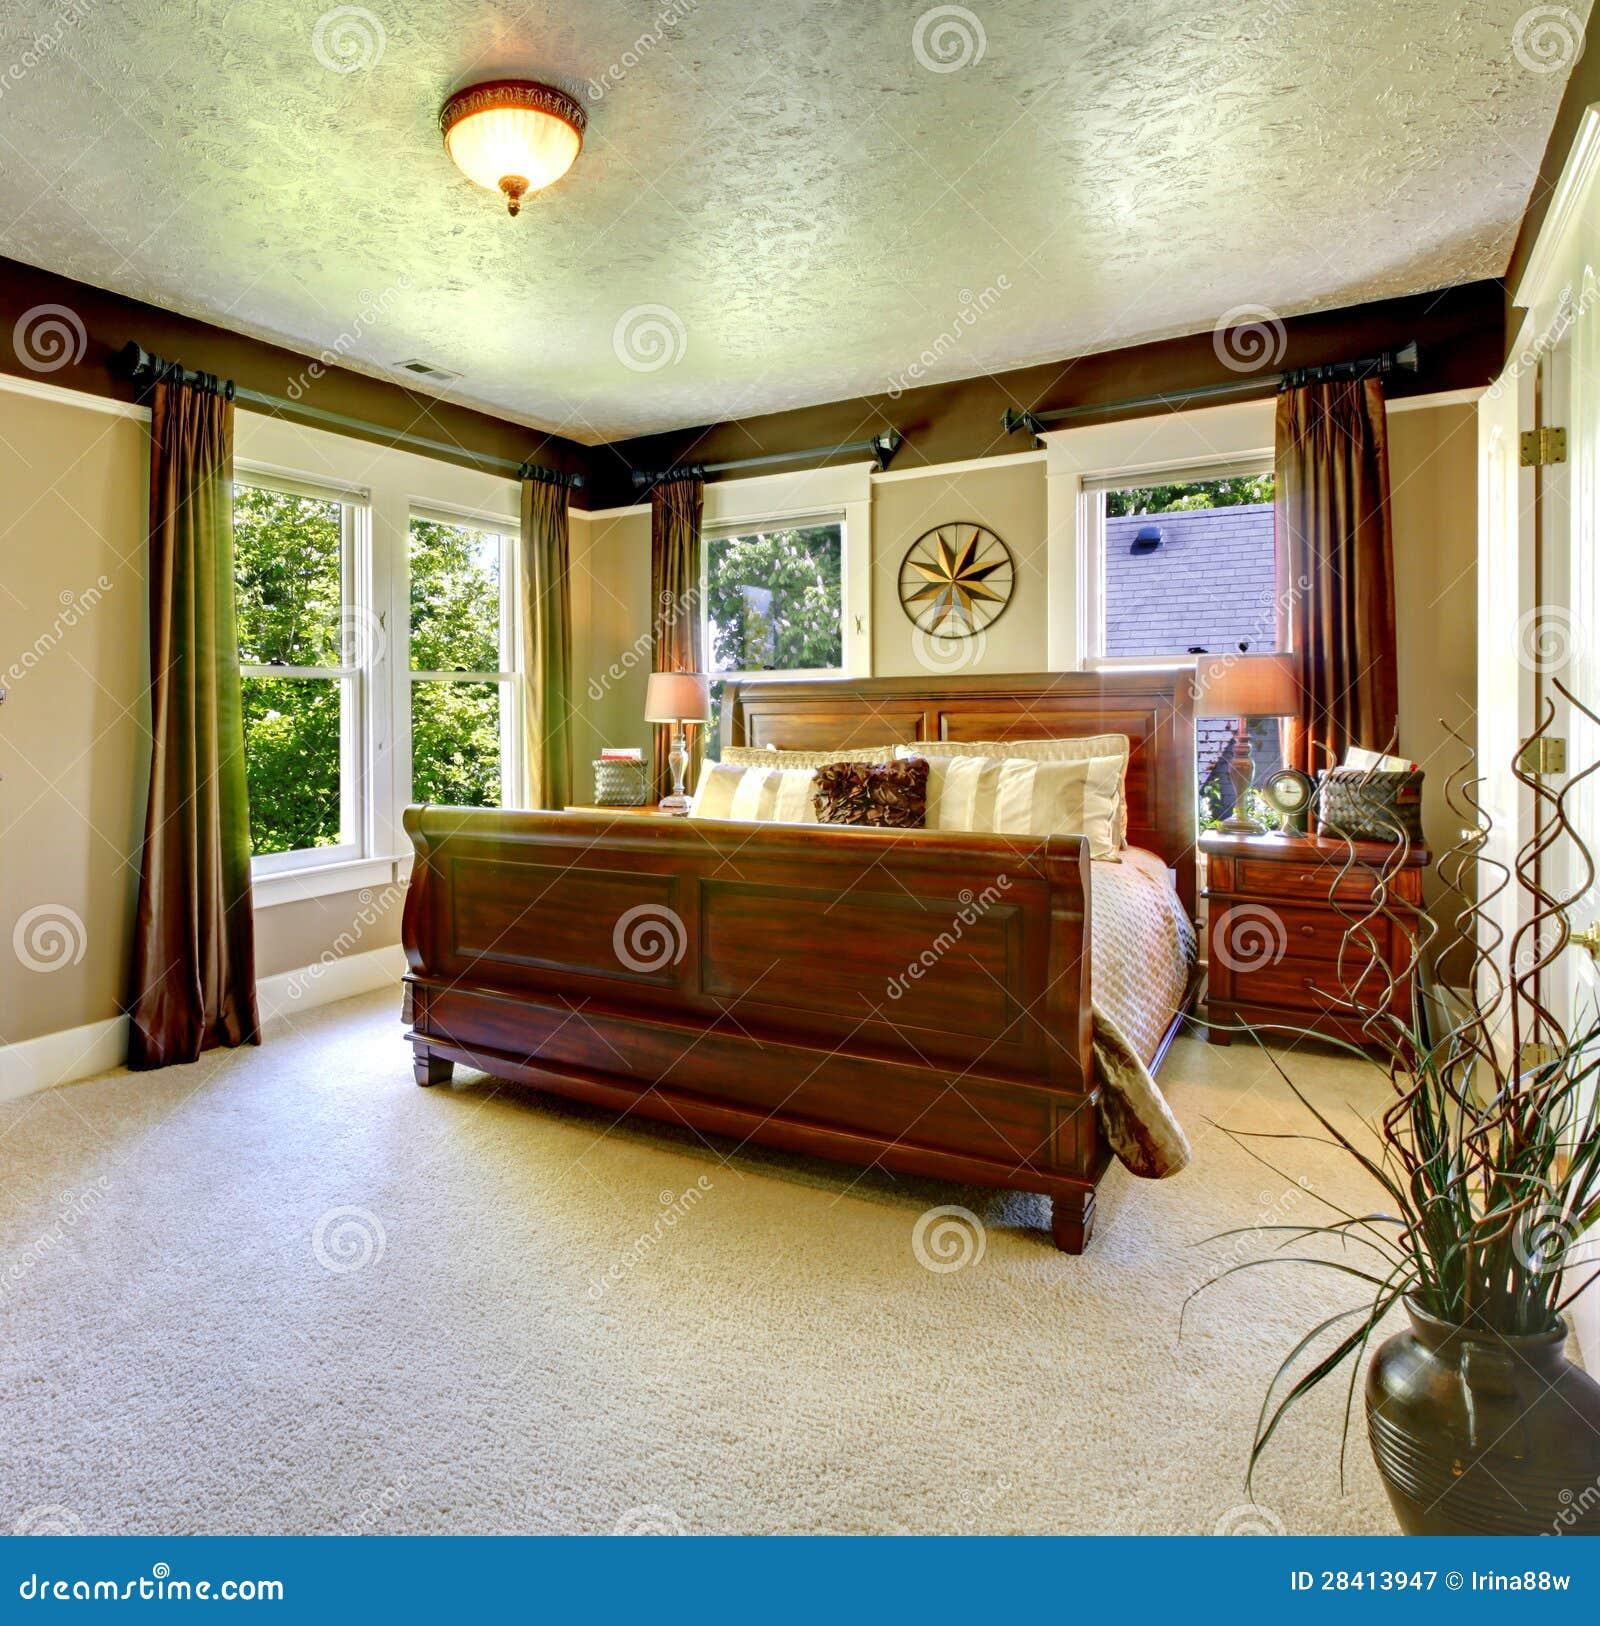 De groene gordijnen in de slaapkamer royalty vrije stock foto's ...